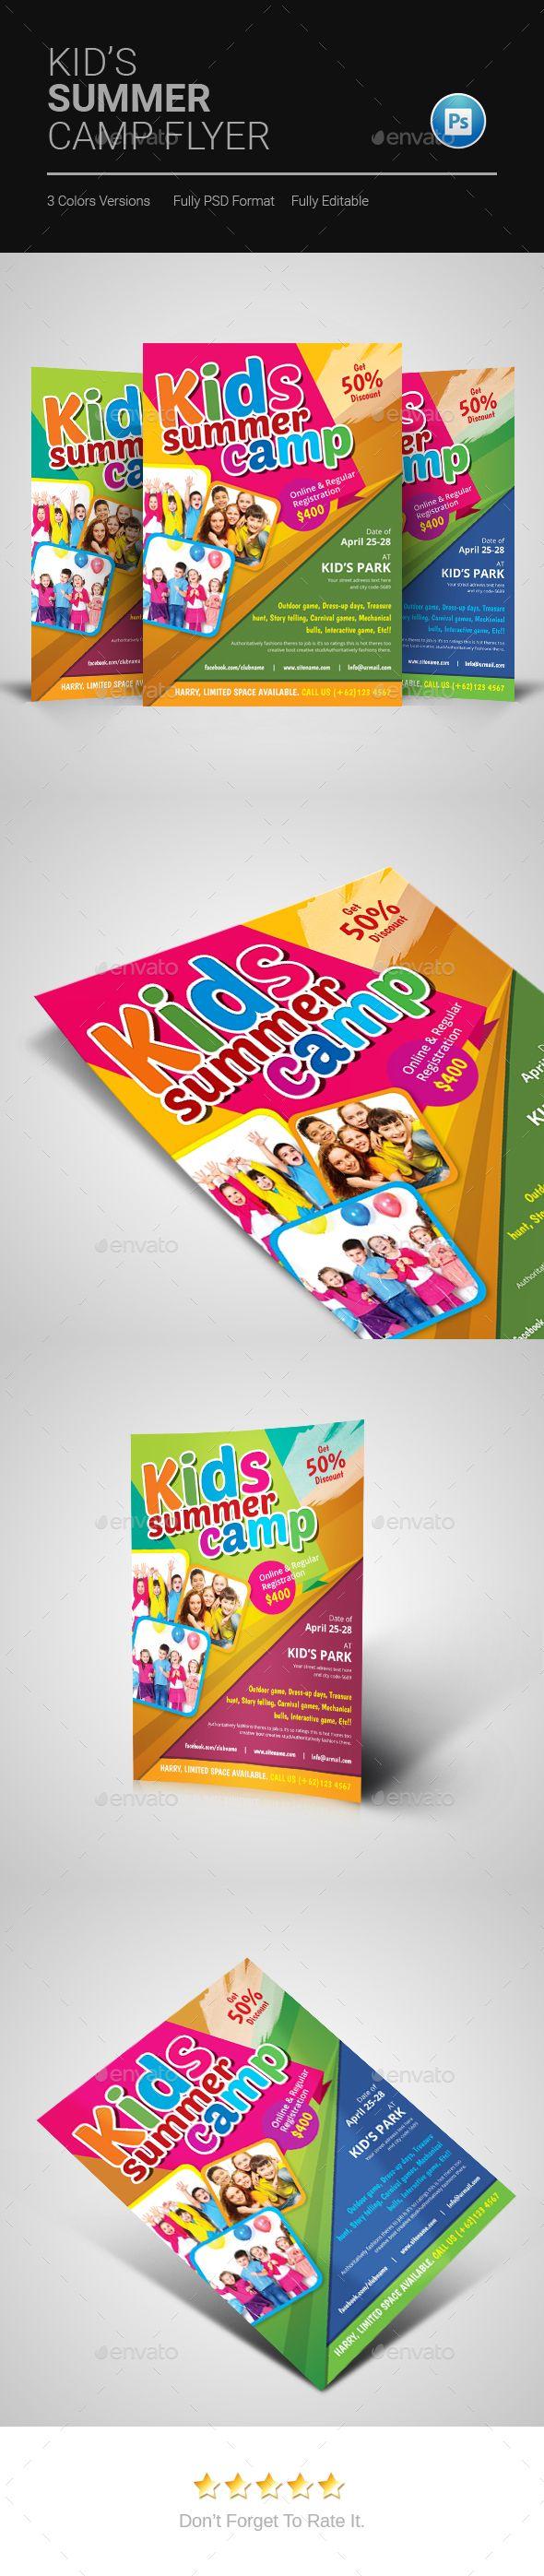 Kids Summer Camp Flyer by artBeta